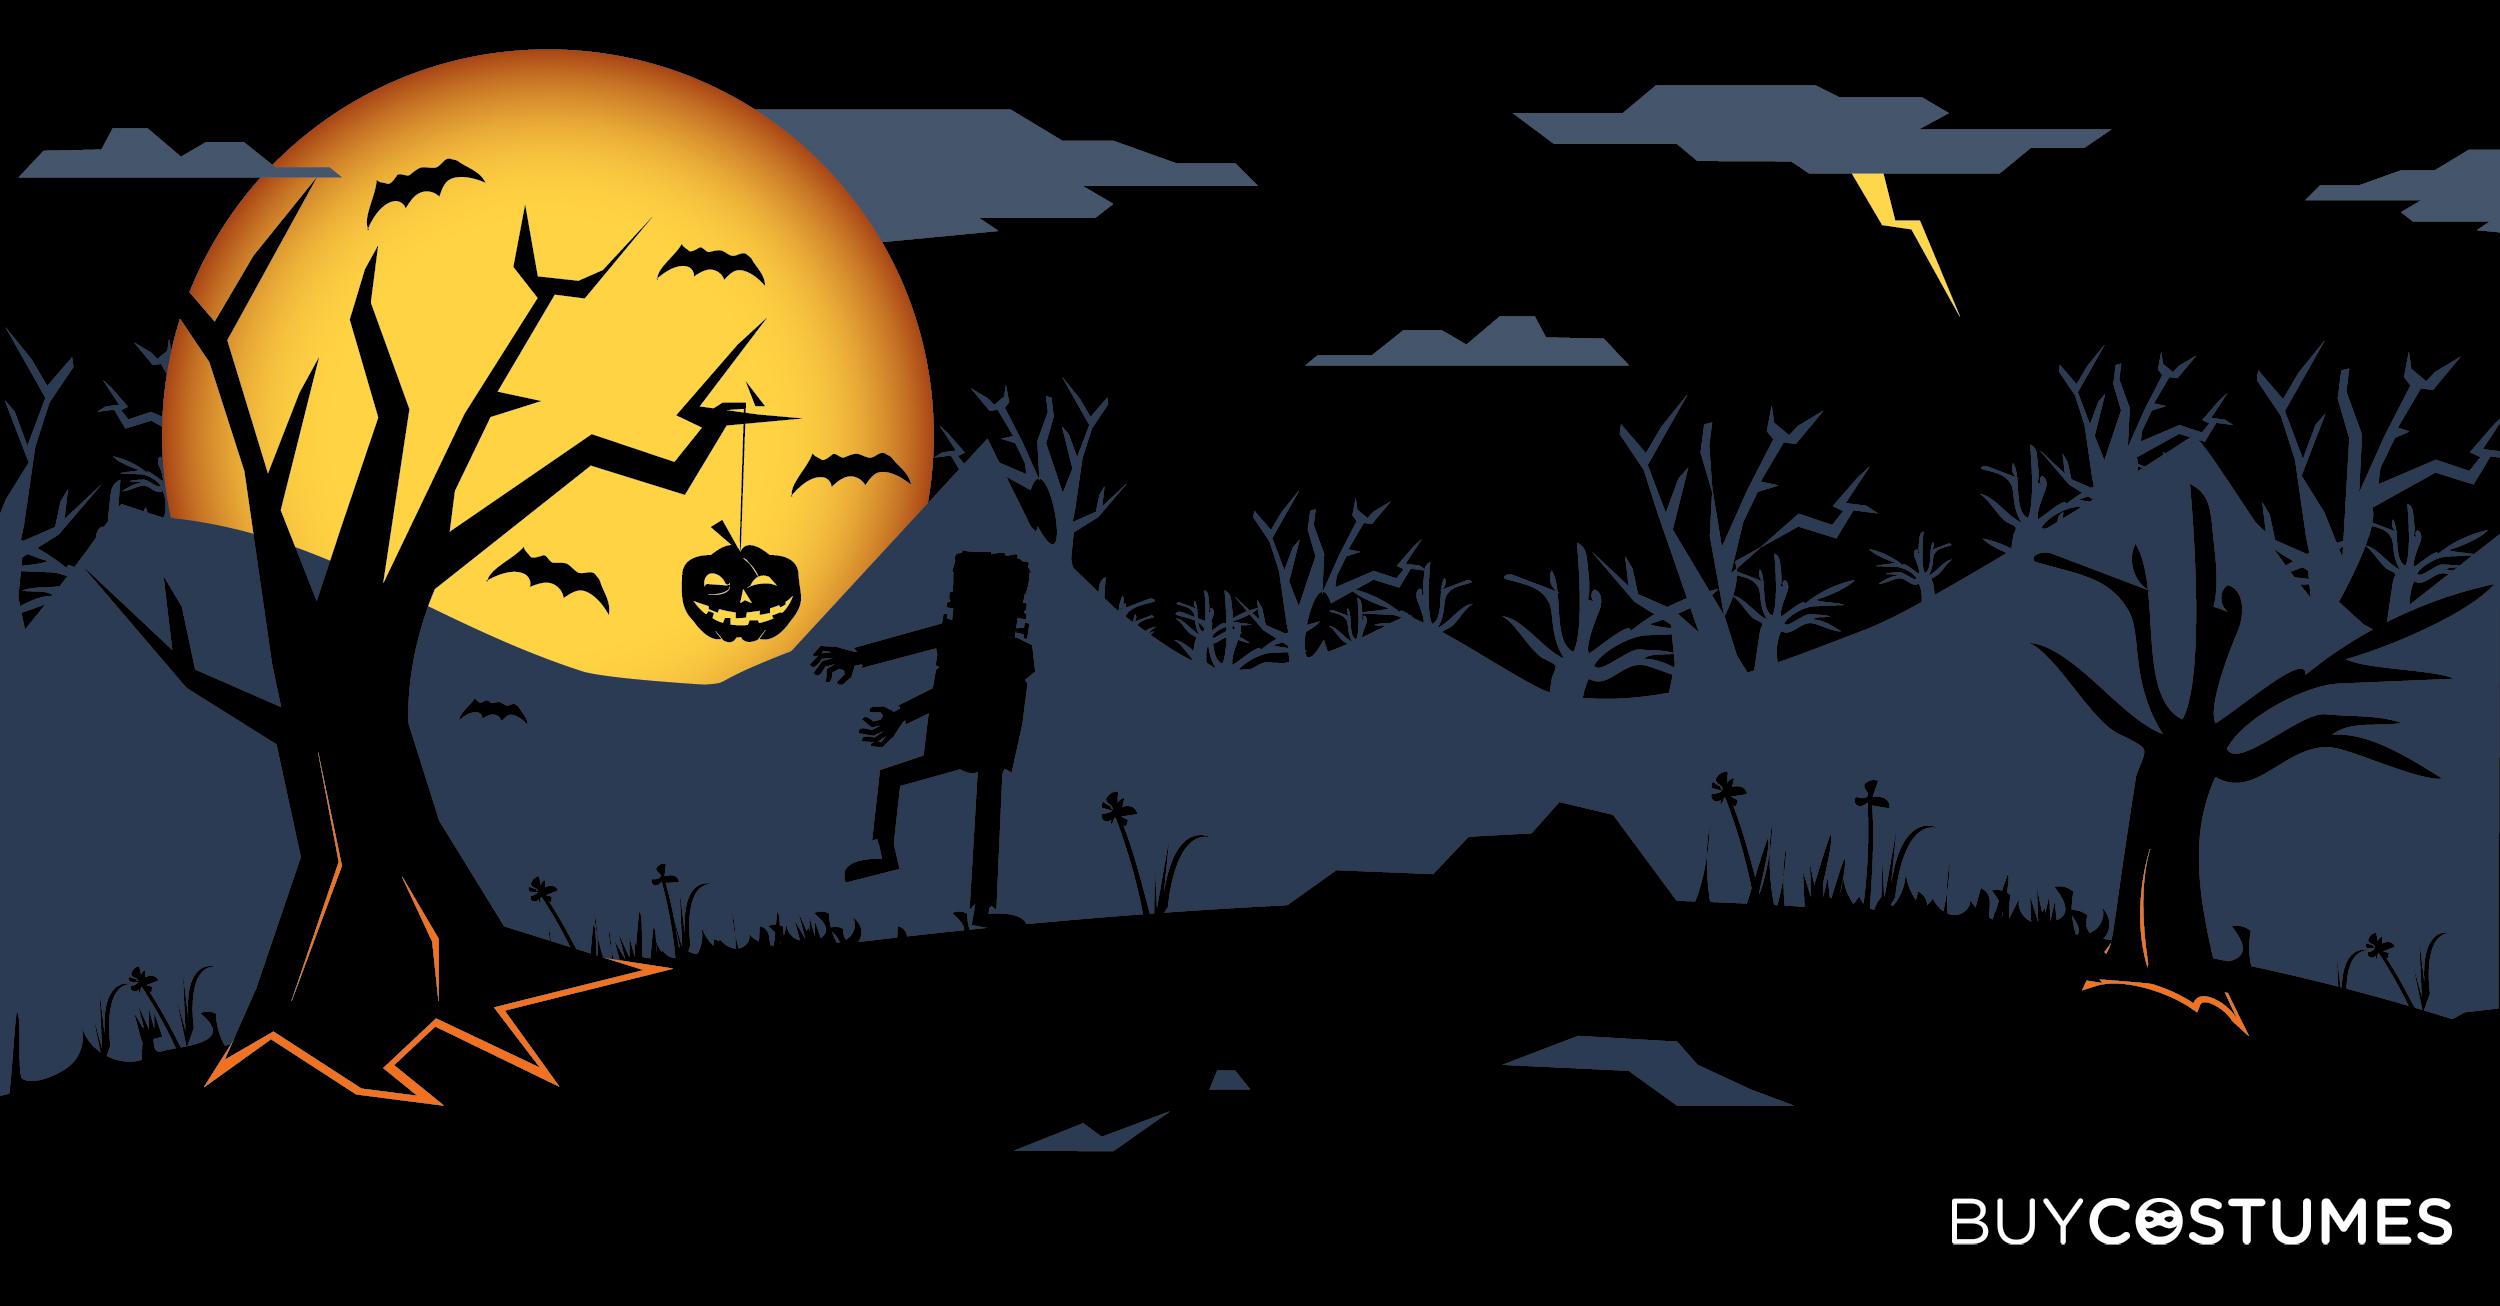 BC_HalloweenLandscape(1200x627).jpg